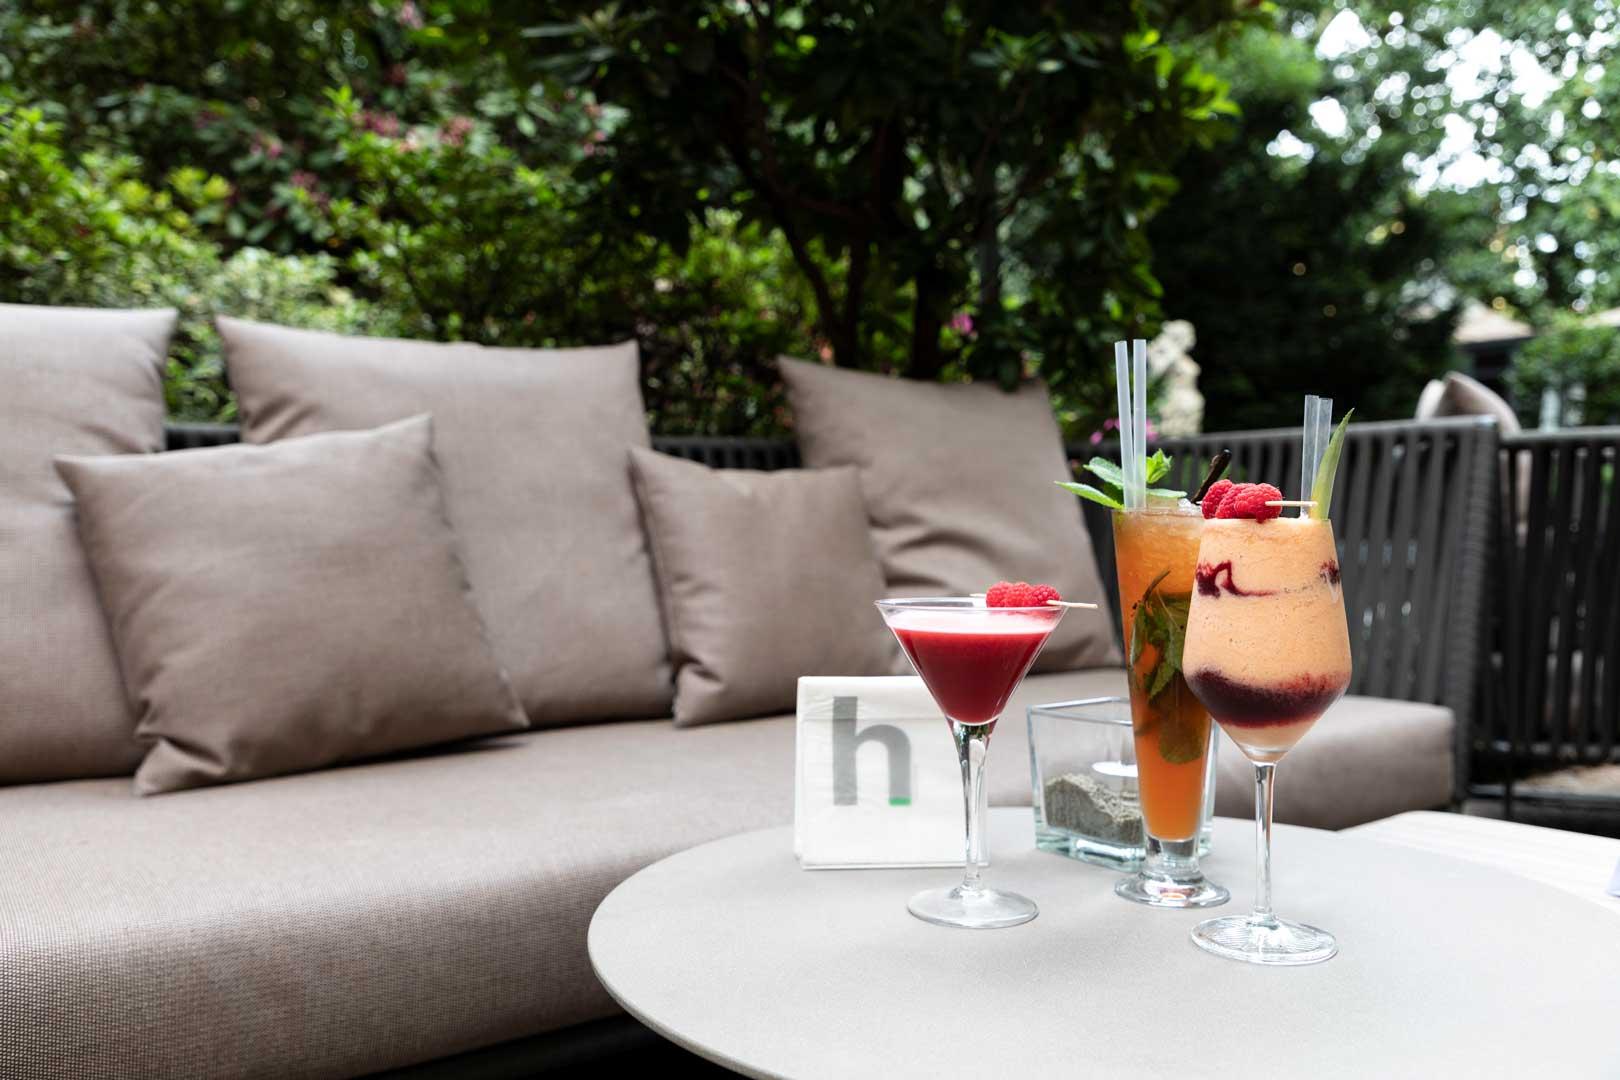 Sheraton Diana Majestic's garden opens again